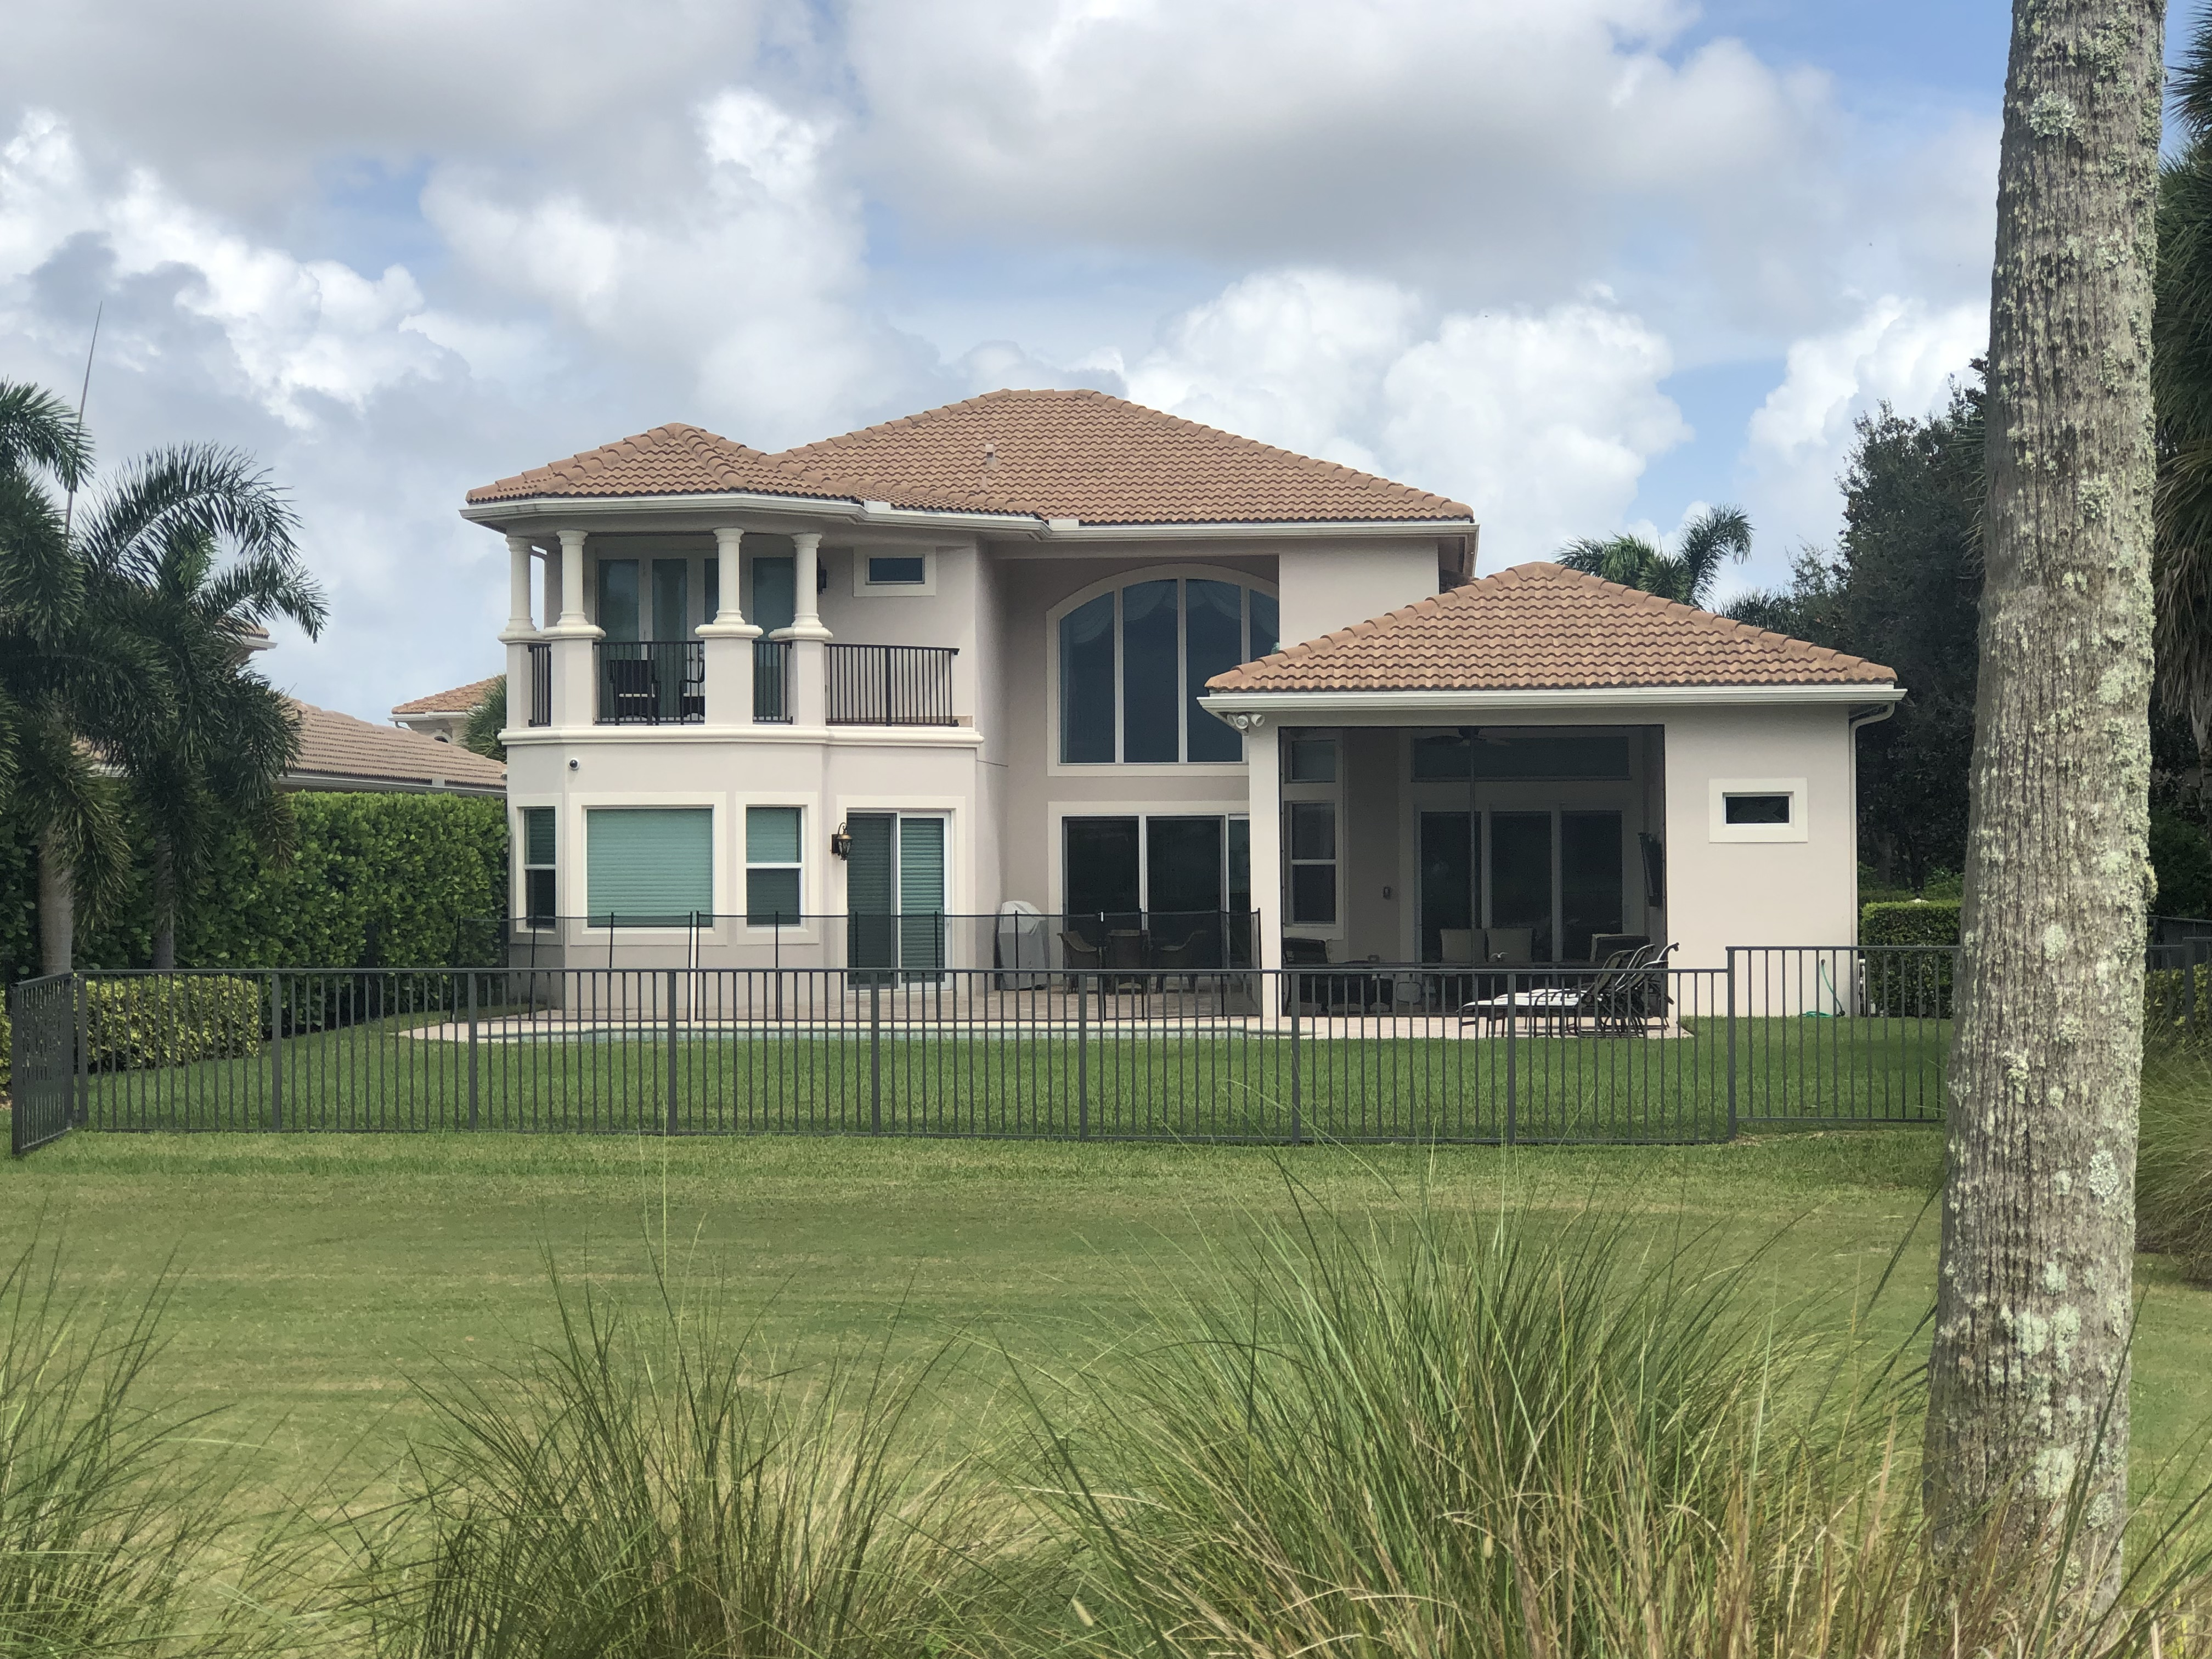 Regency Avenir Palm Beach Gardens Homes For Sale